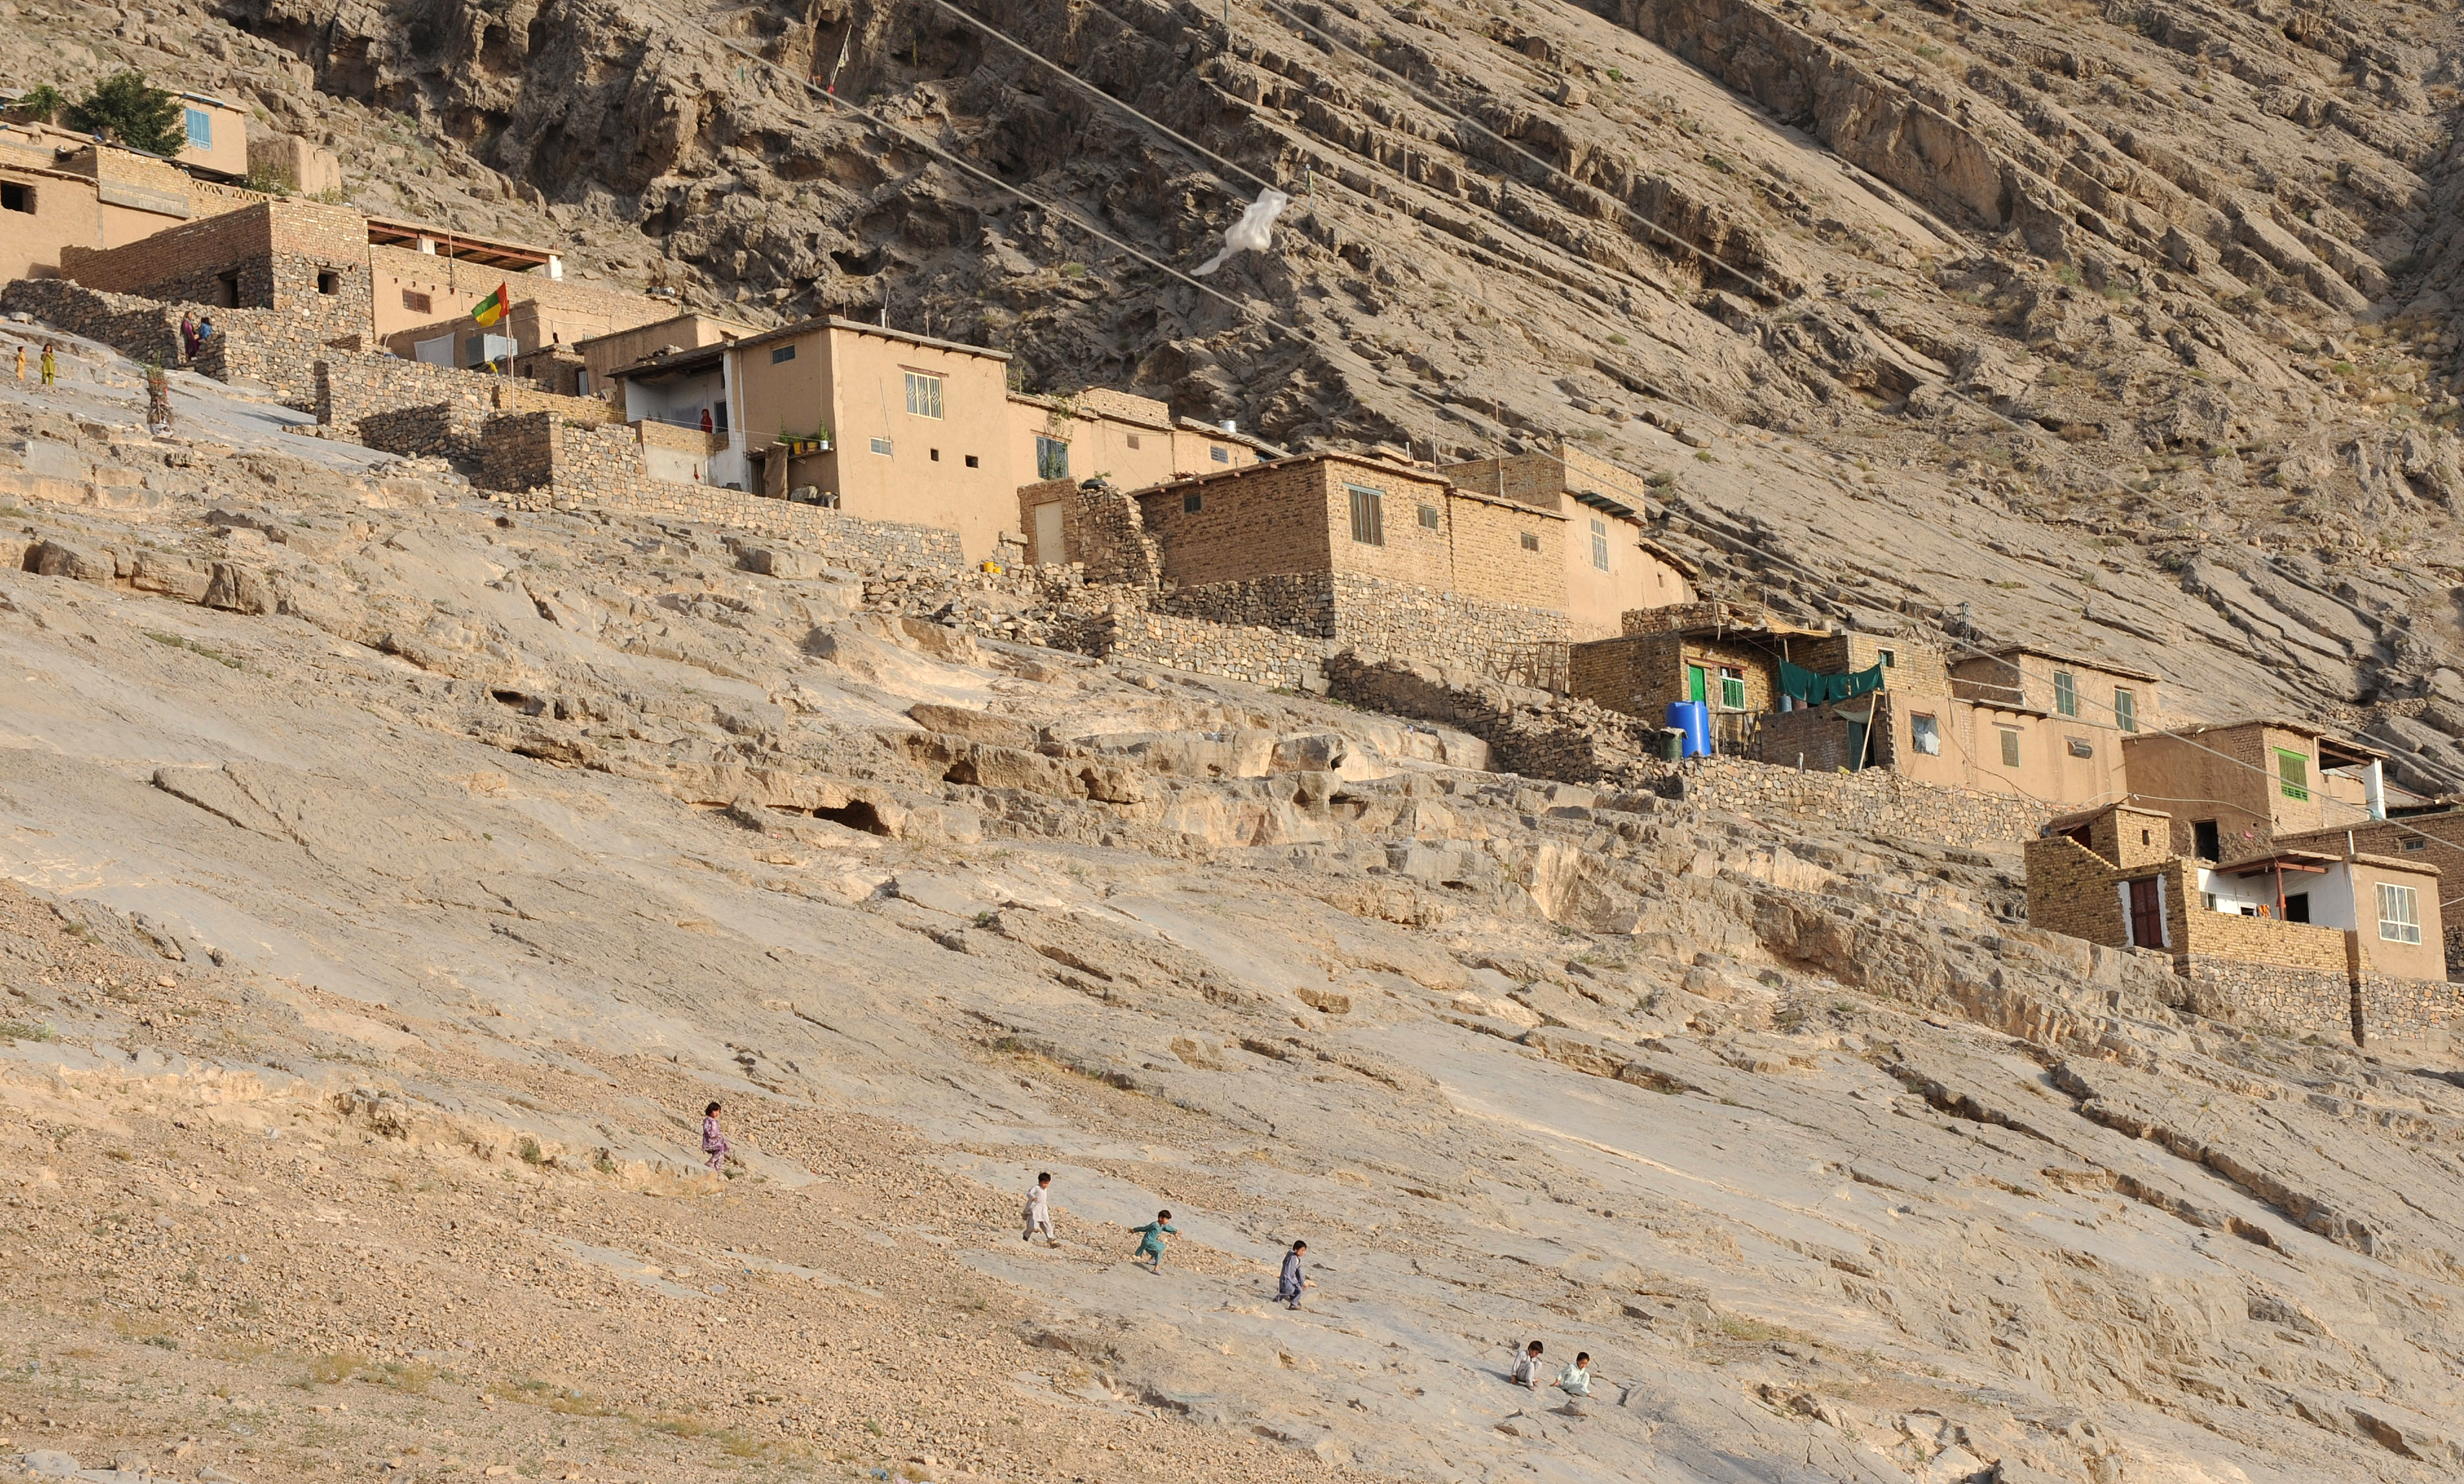 Balochistan's Hazara angry at coal miner murders